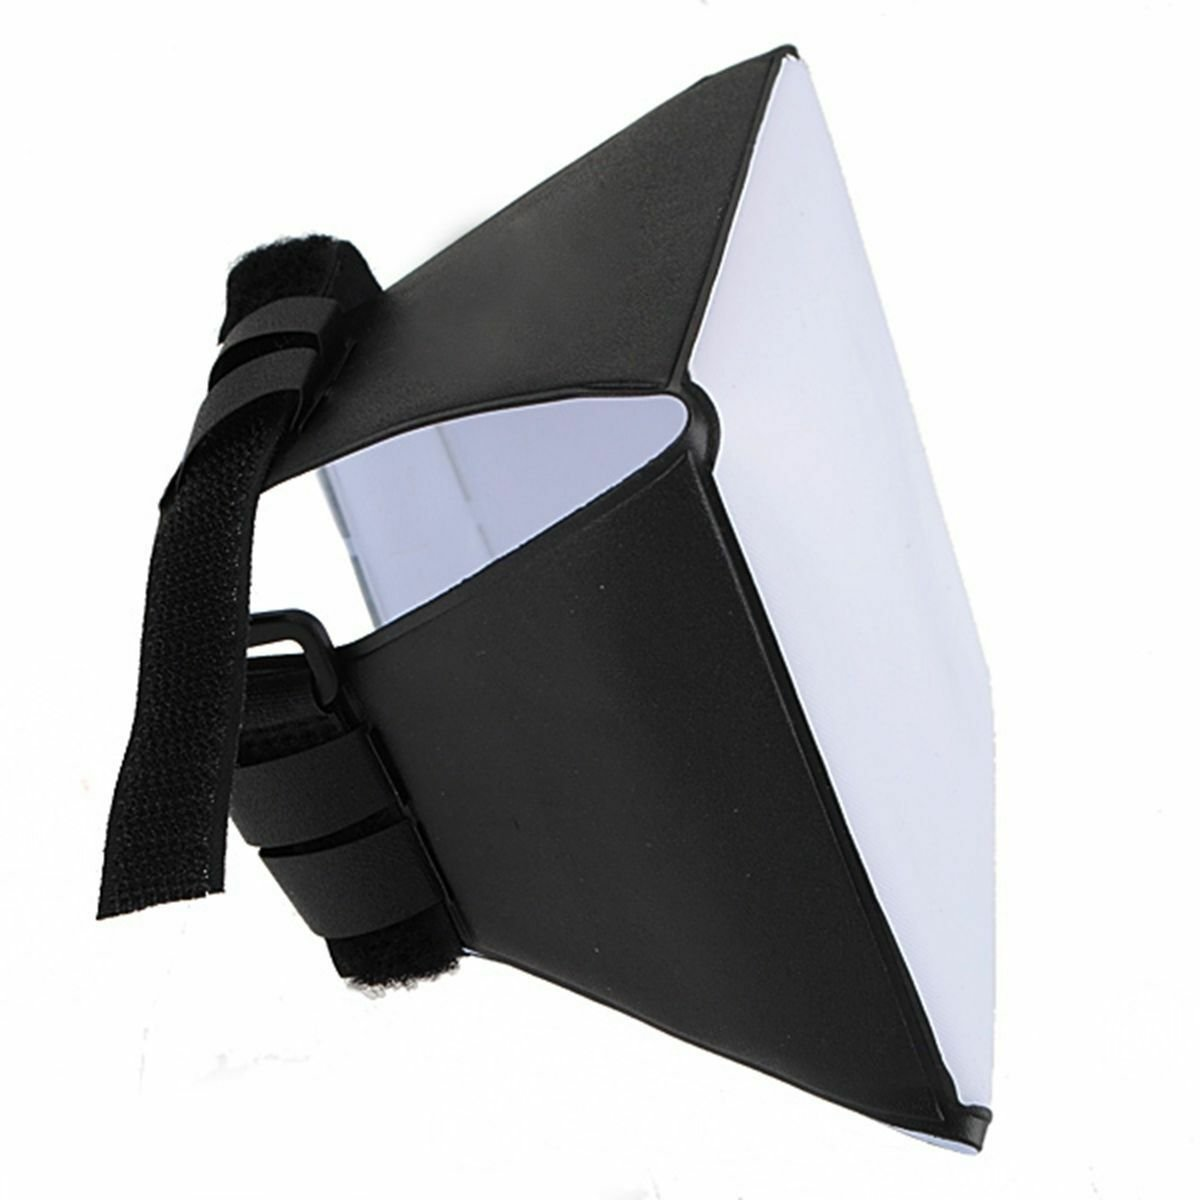 Universal Pop-up Flash Diffuser Soft Box For Canon Nikon Sigma Off-Camera